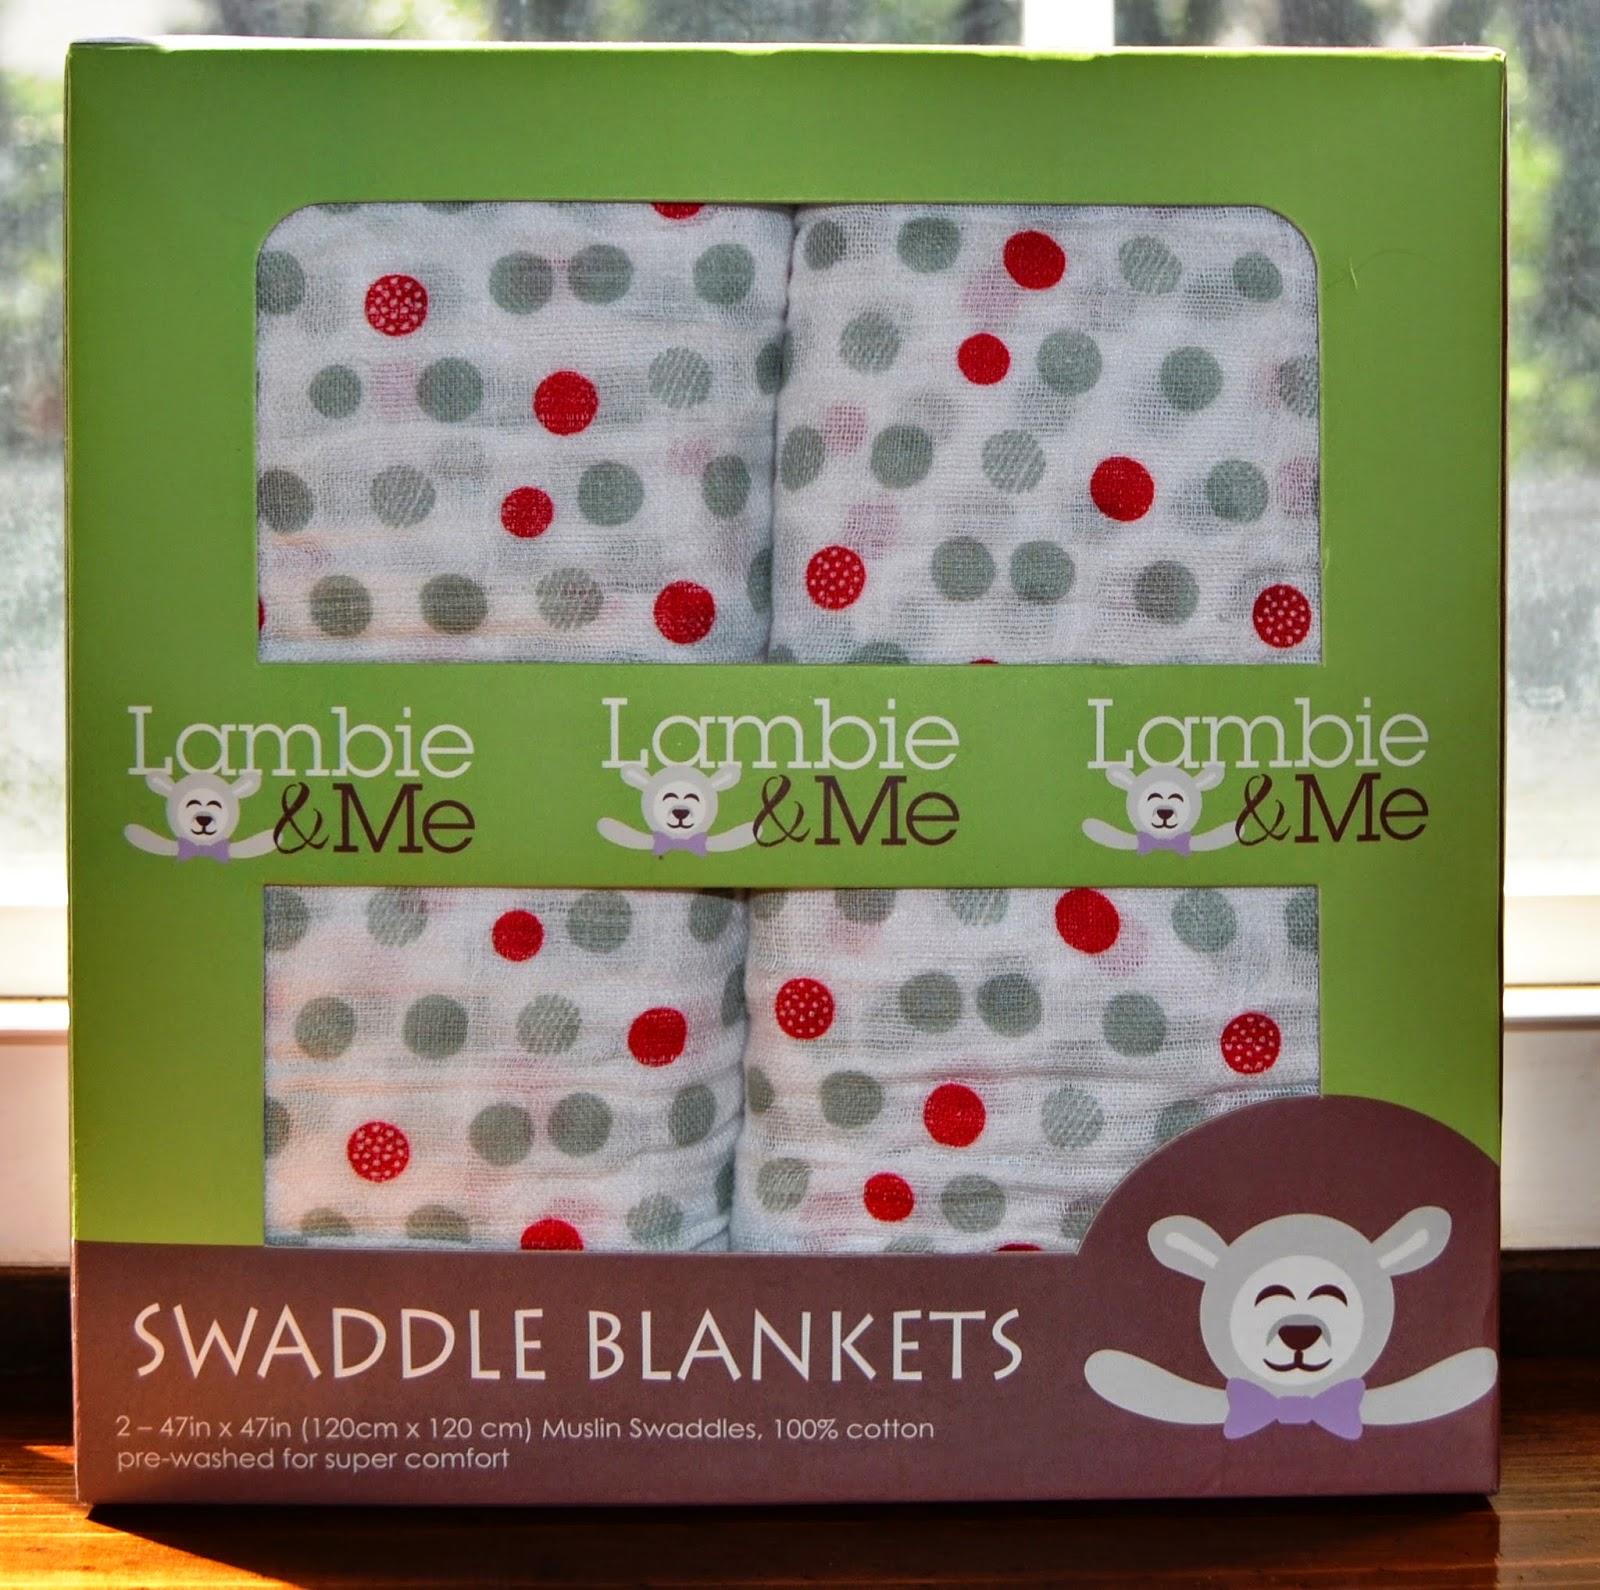 Lambie & Me Organic Swaddle Blankets